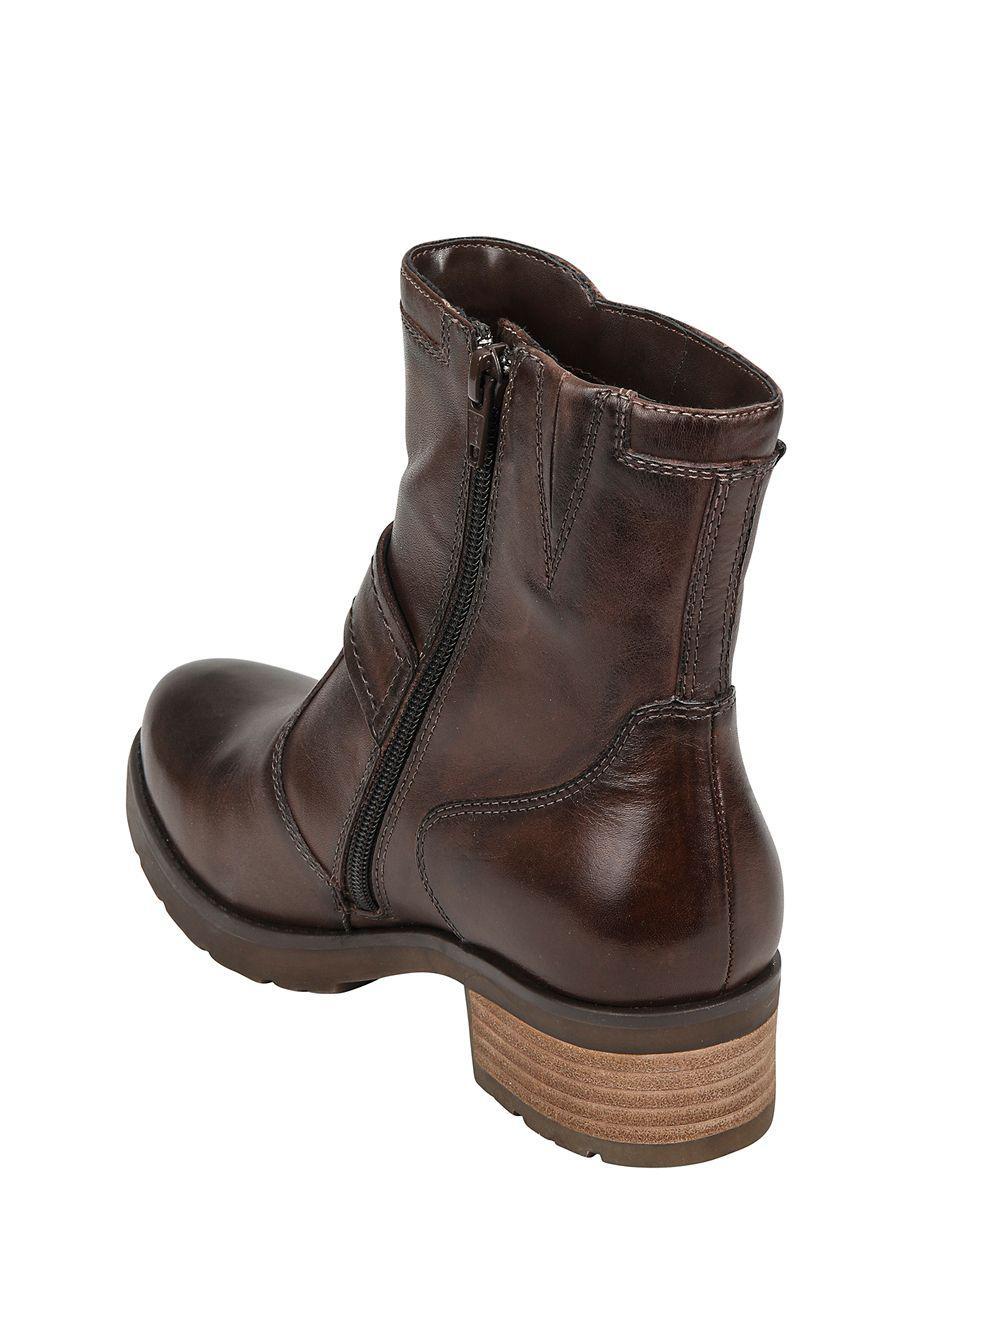 9dbbda2aa70 Earth Drumlin Leather Booties in Brown - Lyst